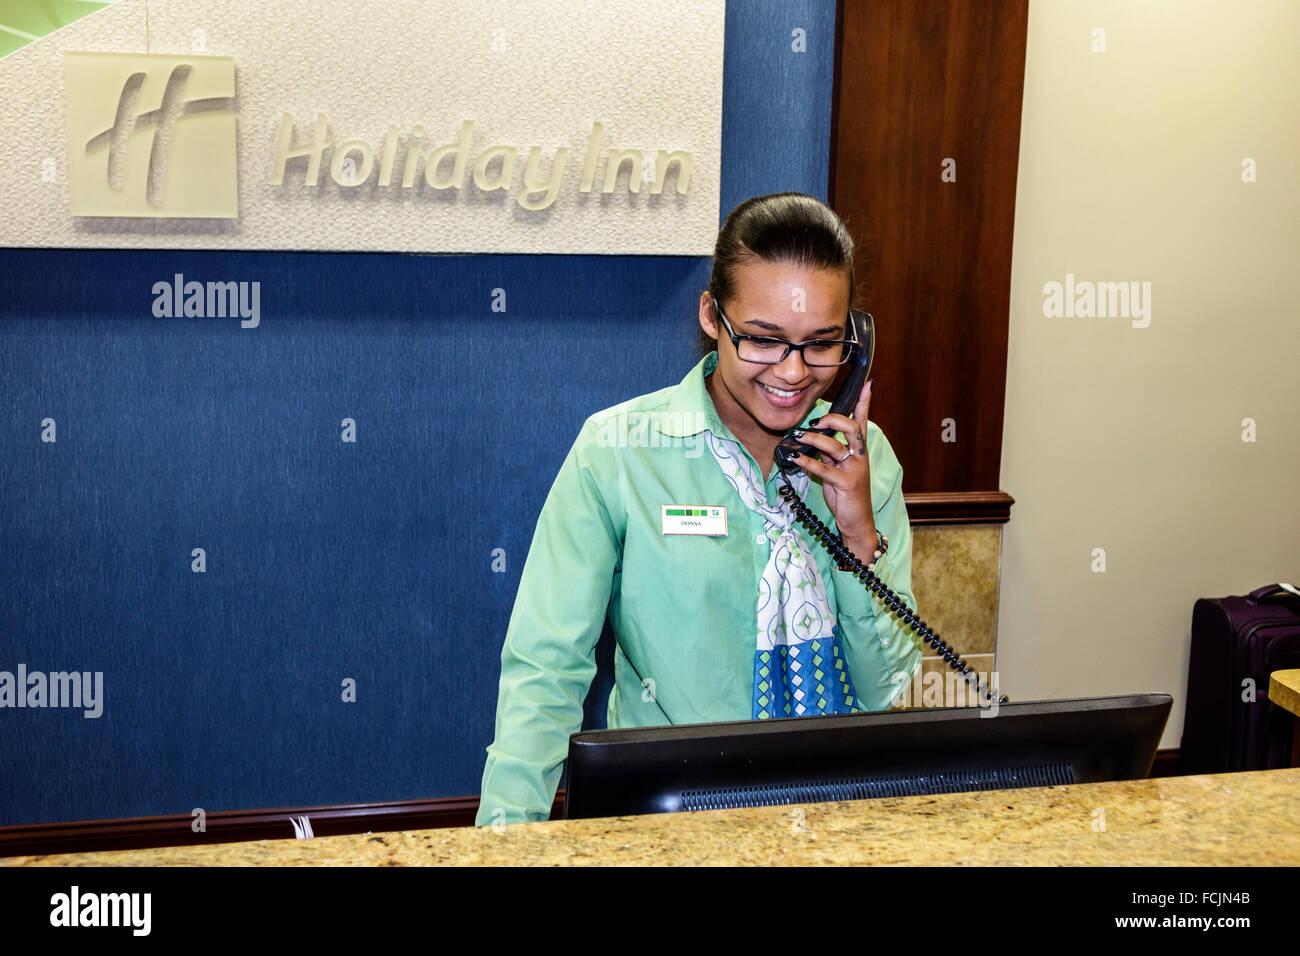 Orlando Kissimmee Orlando Florida Holiday Inn hotel inside lobby front desk Black woman employee telephone phone - Stock Image